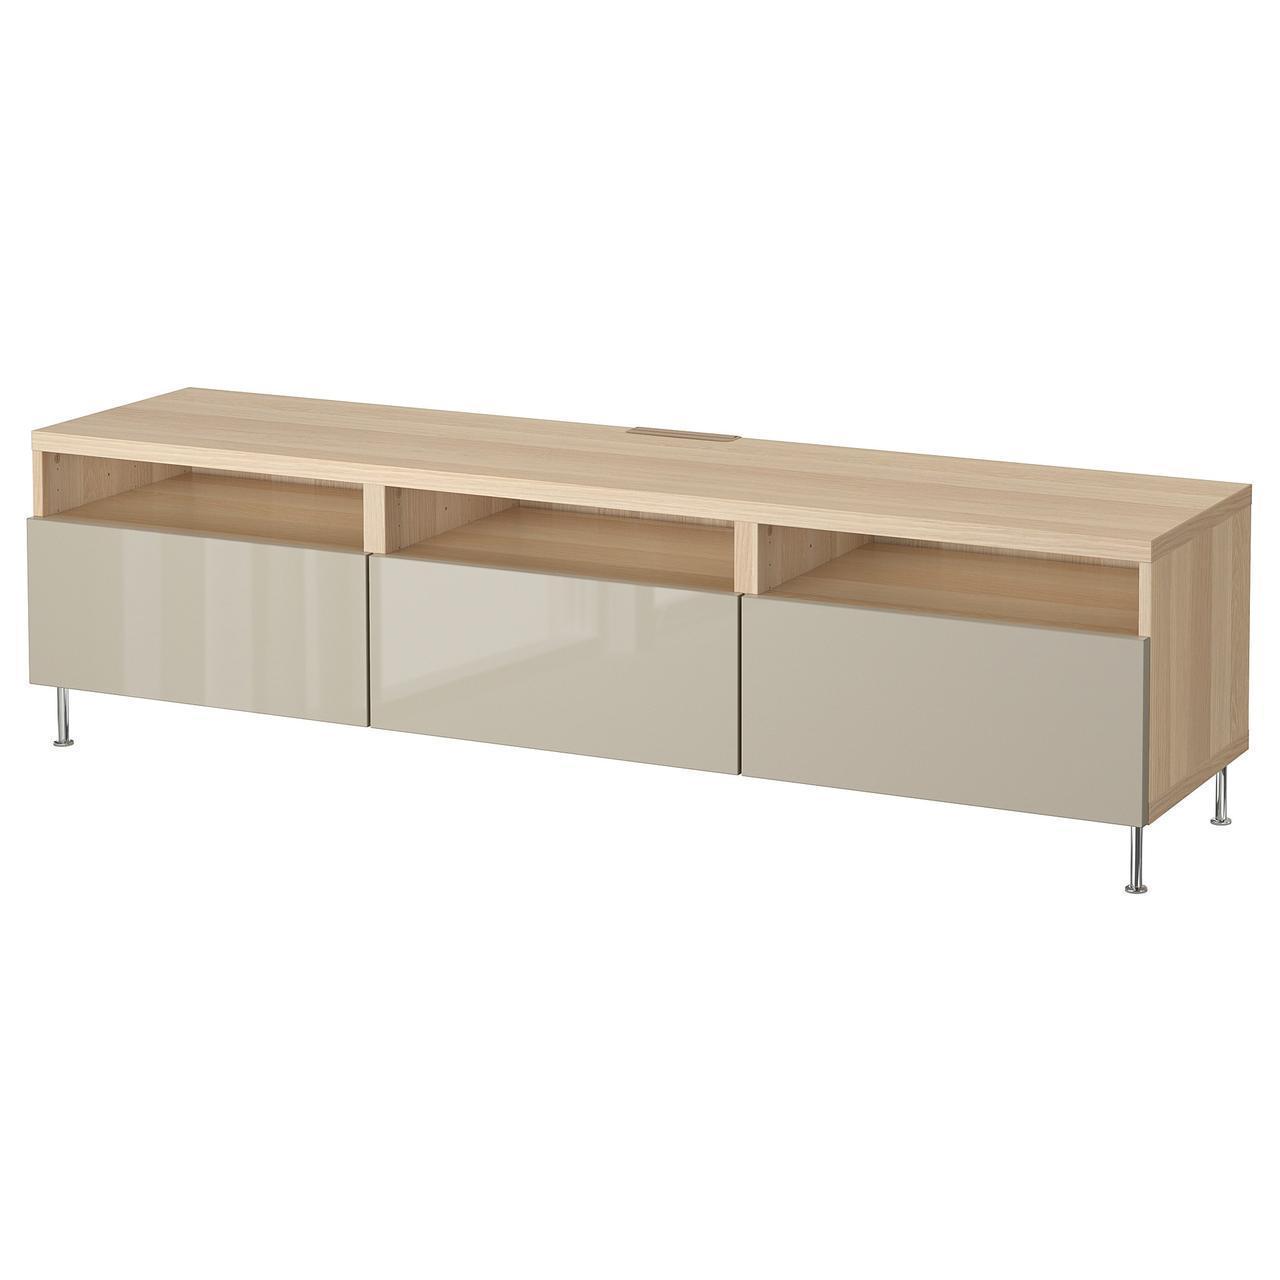 IKEA BESTA Тумба под телевизор с ящиками, белый дуб, Сельсвикен/Сталларп бежевый  (292.682.63)